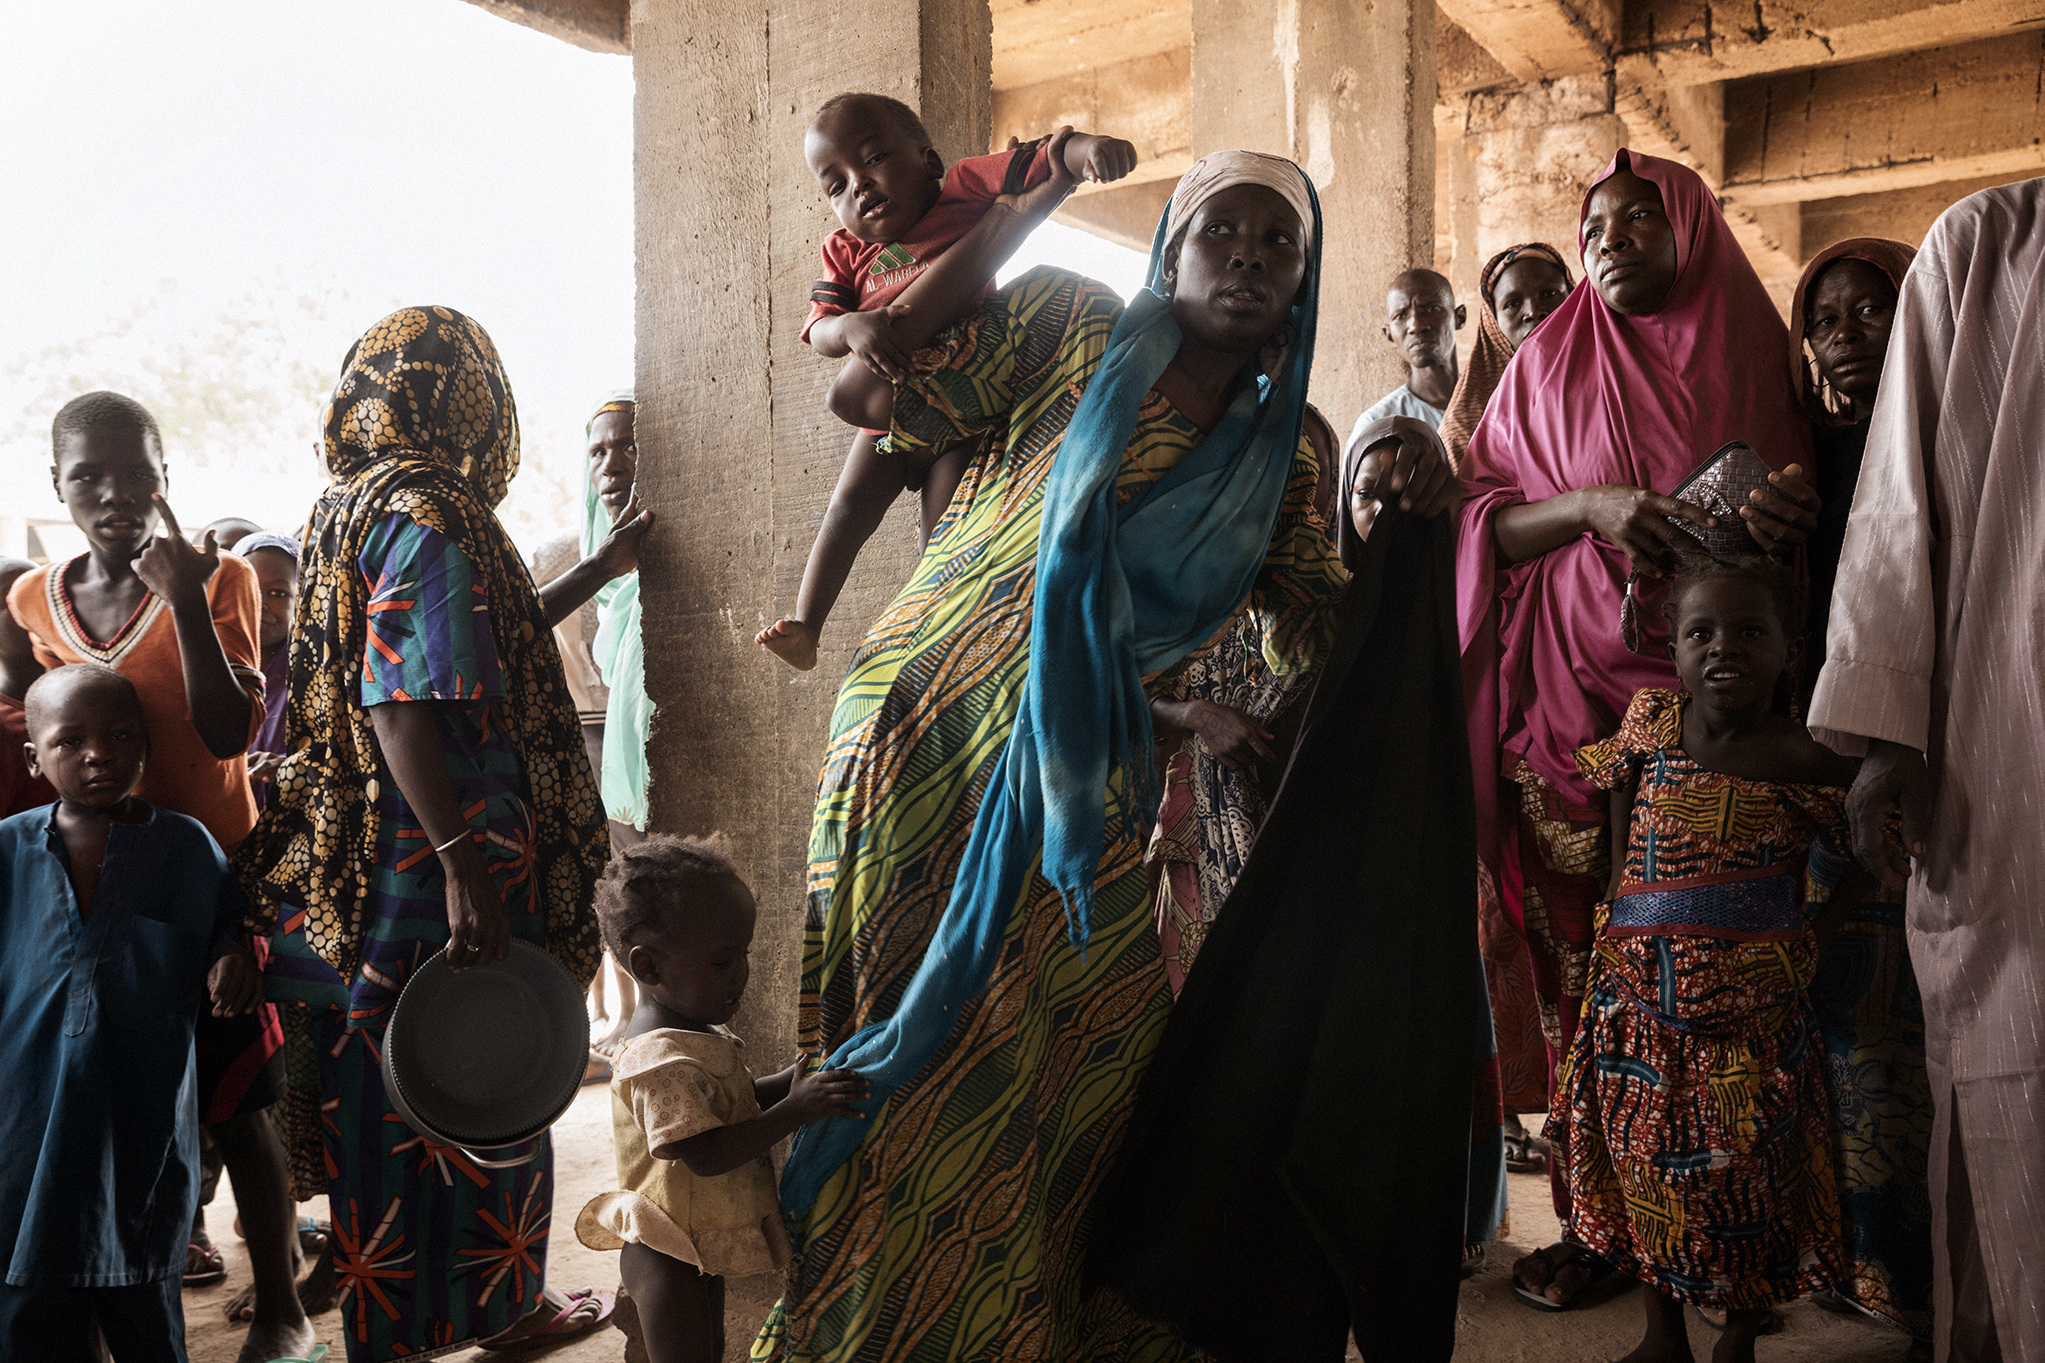 Internally displaced people at the the Dalori camp on the outskirts of Maiduguri, Nigeria.